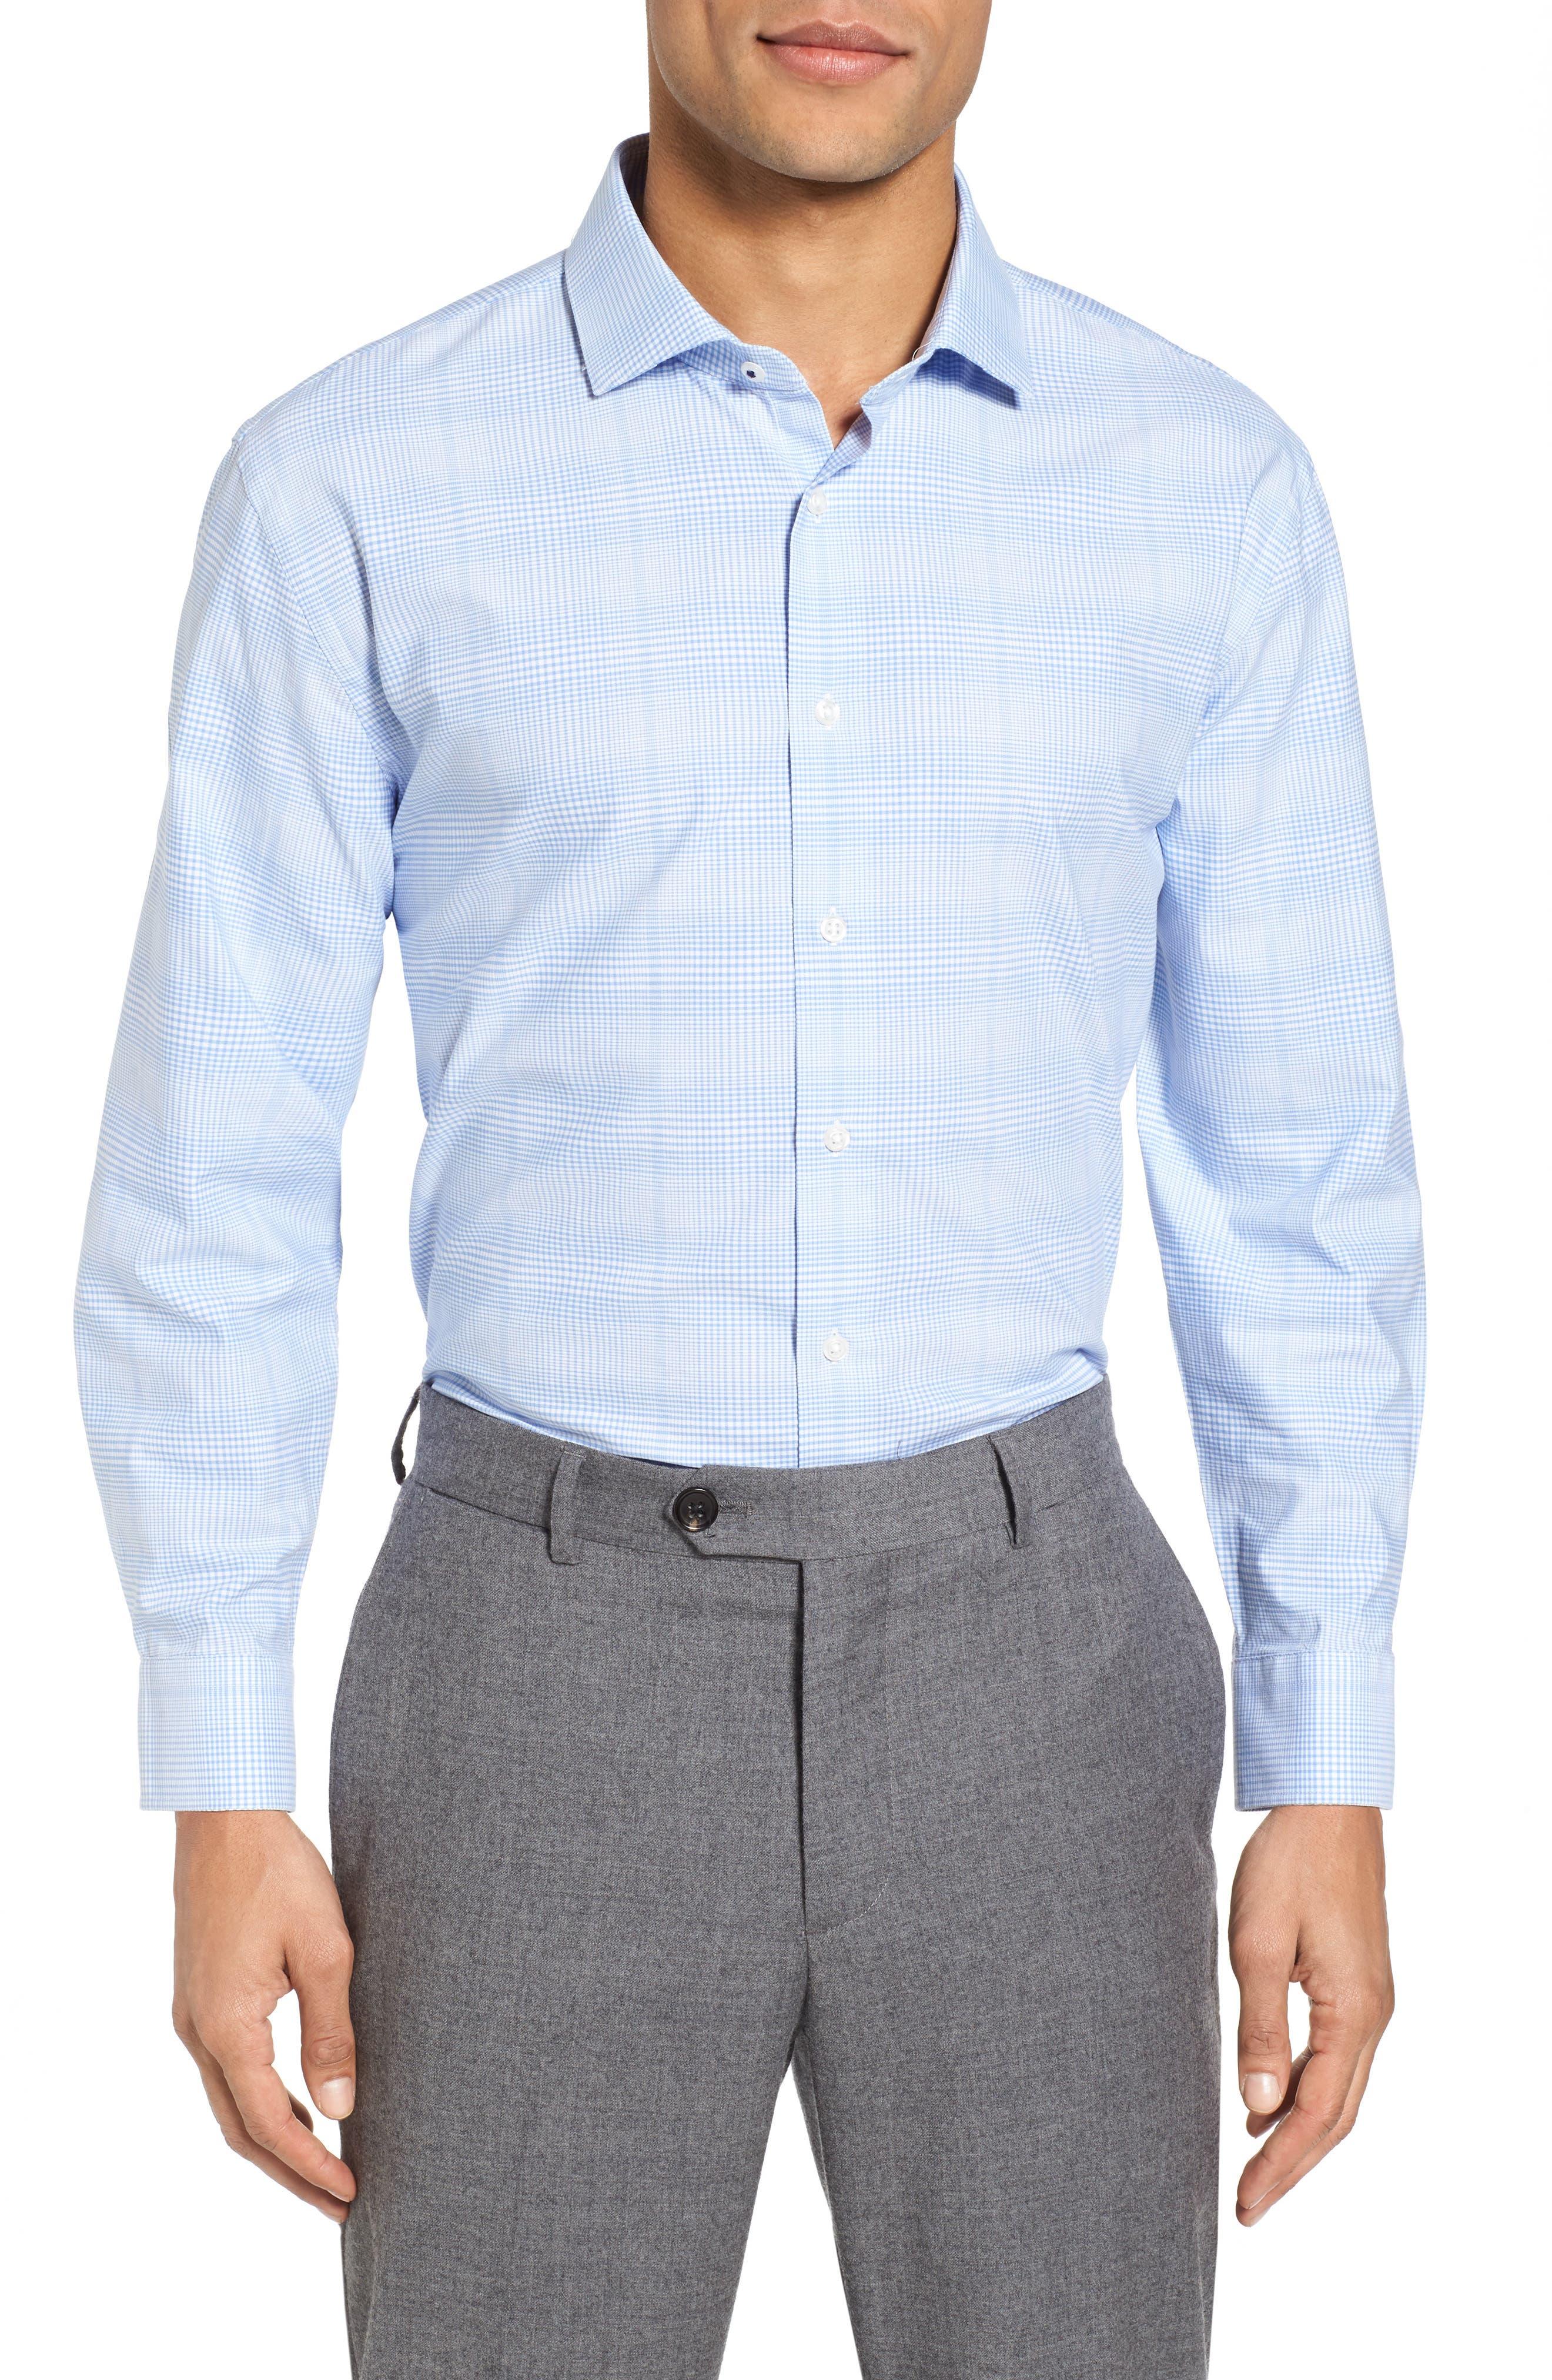 Alternate Image 2  - Nordstrom Men's Shop Tech-Smart Trim Fit Check Dress Shirt